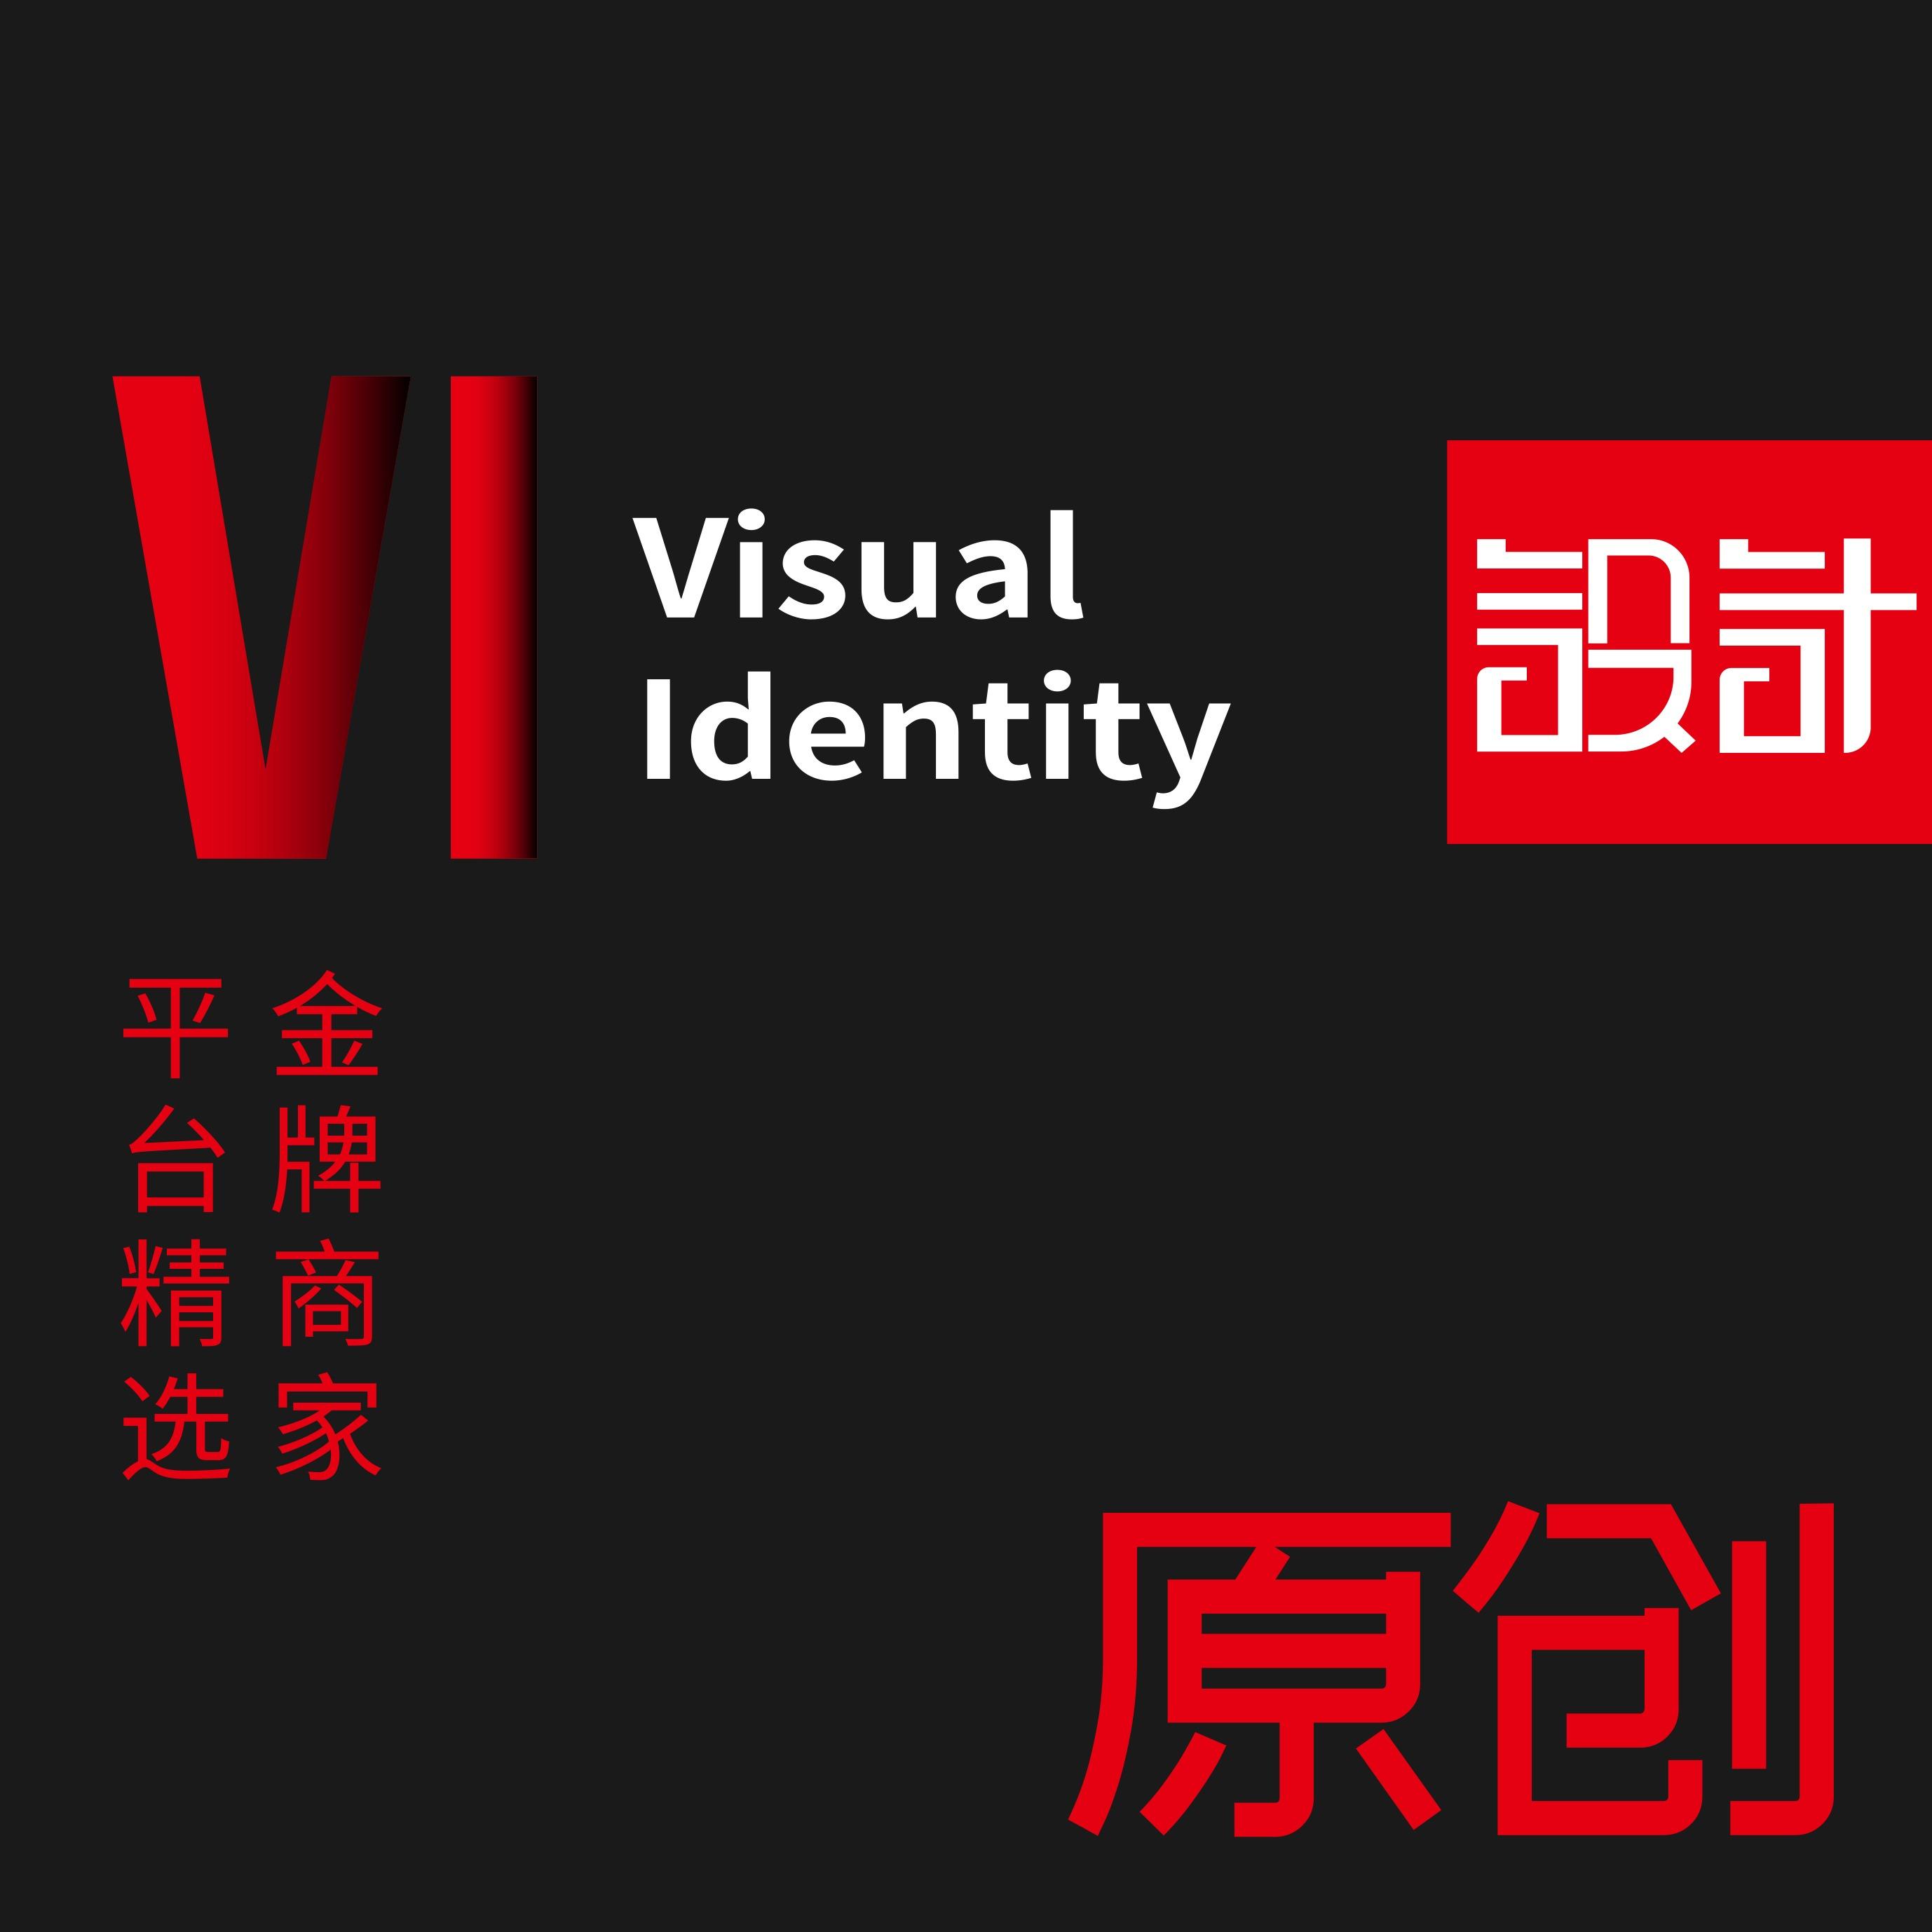 vi设计vis设计VI导视系统设计企业视觉识别系统设计图形